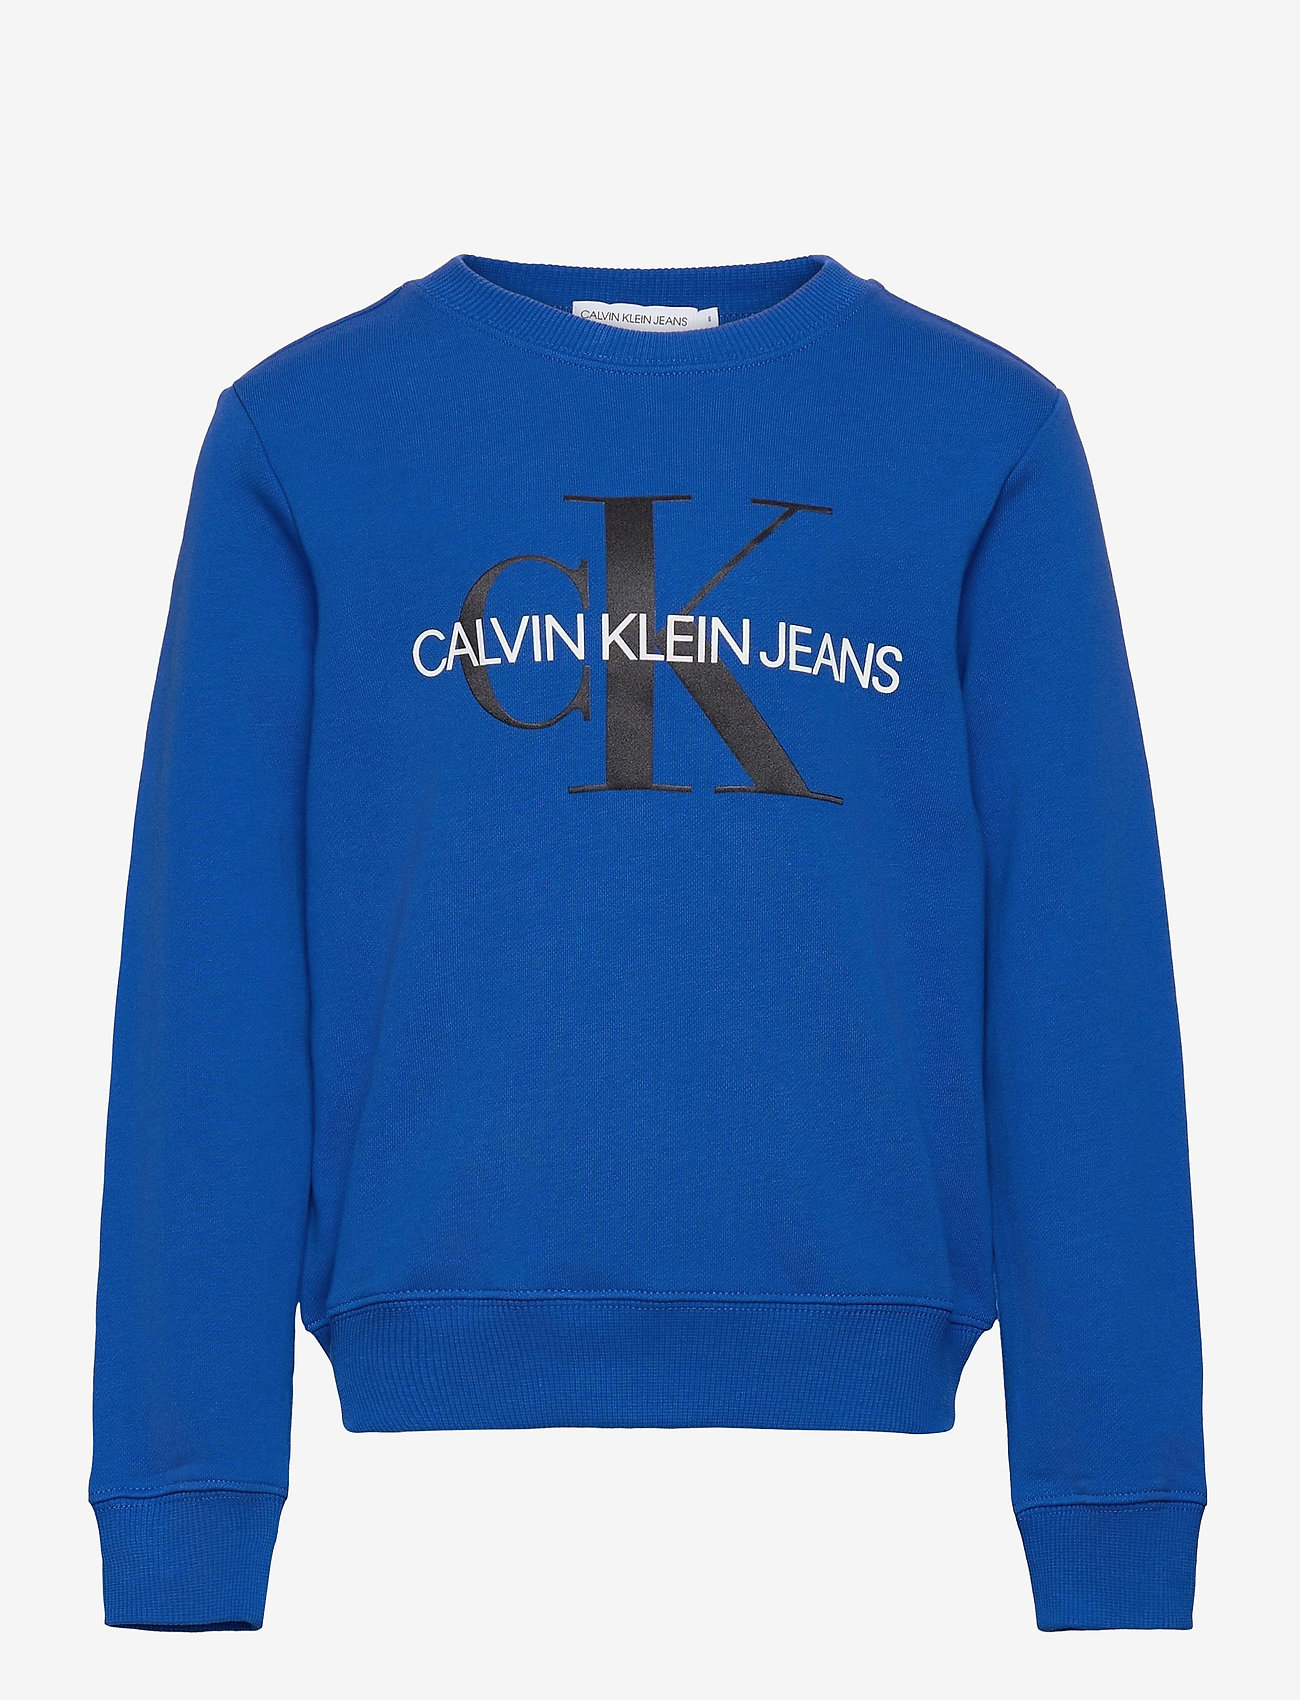 Calvin Klein - MONOGRAM LOGO SWEATSHIRT - sweatshirts - ultra blue - 0